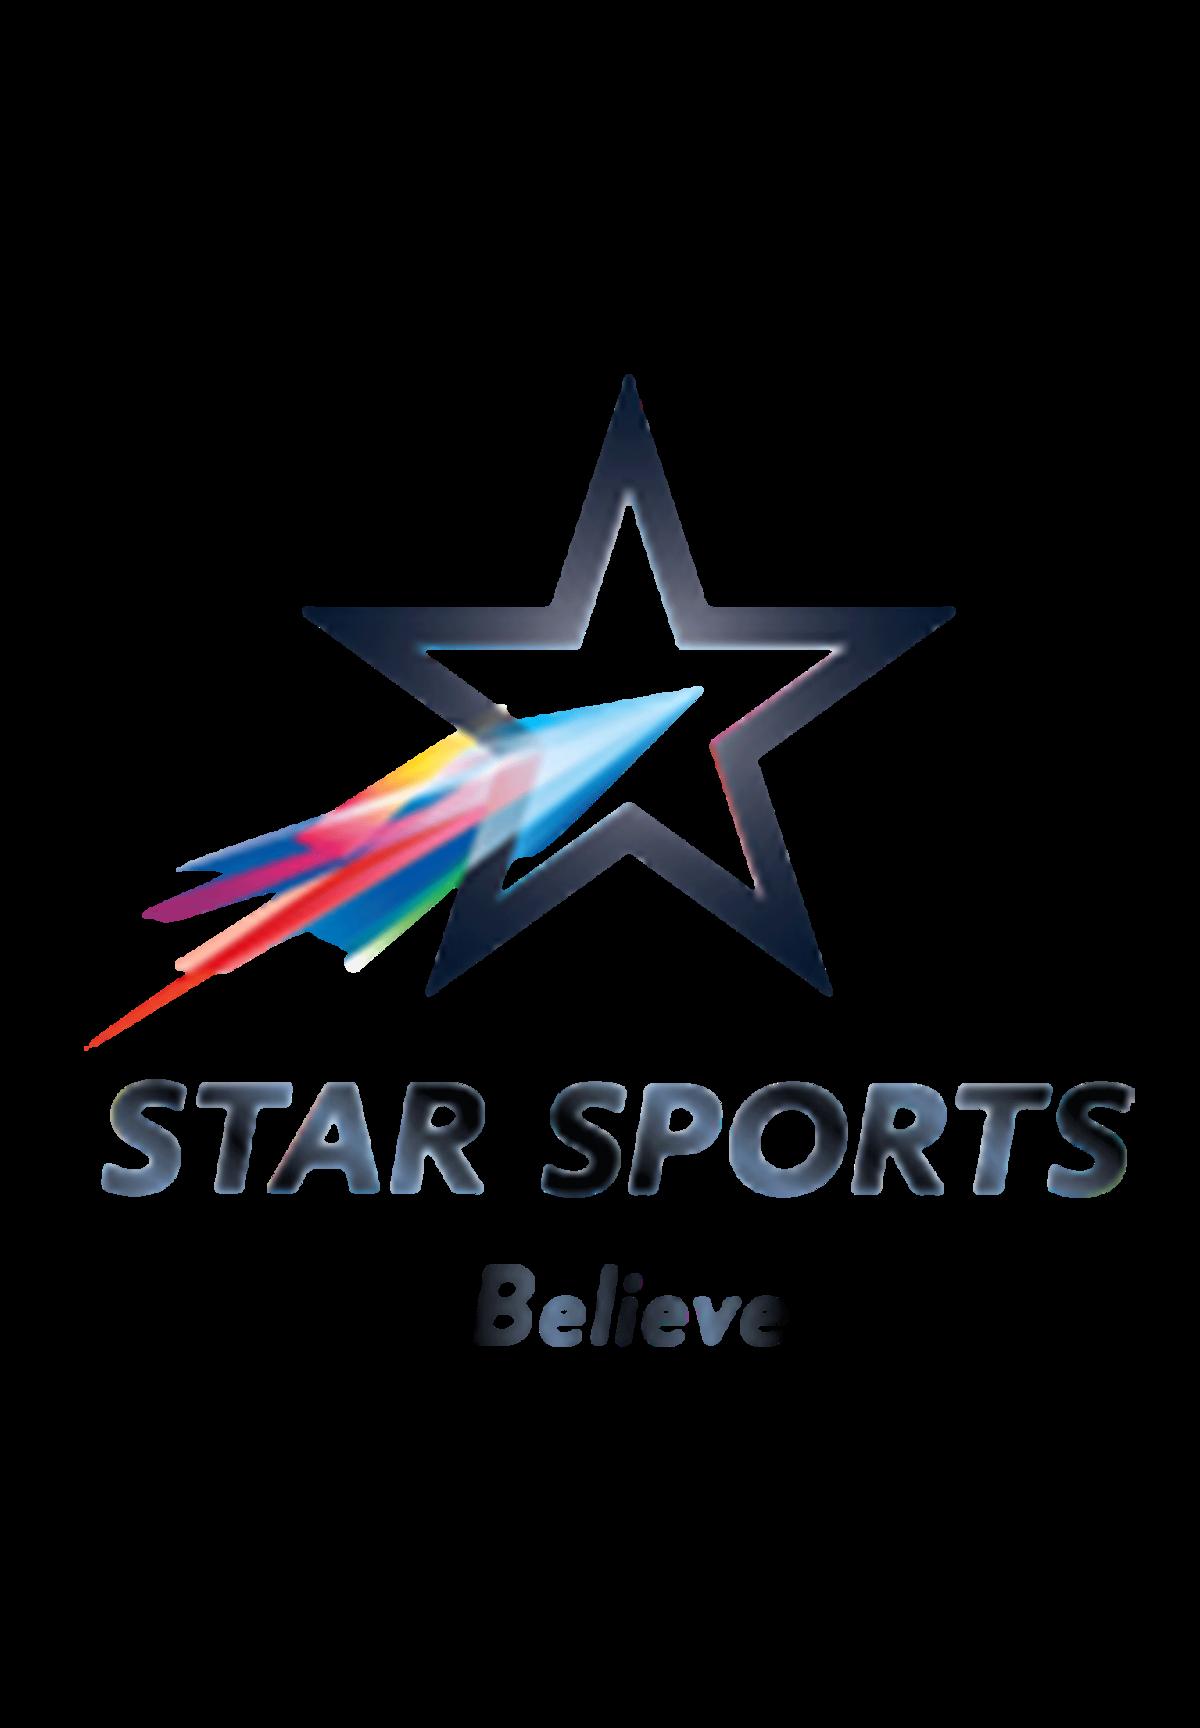 Actofit Star Sports